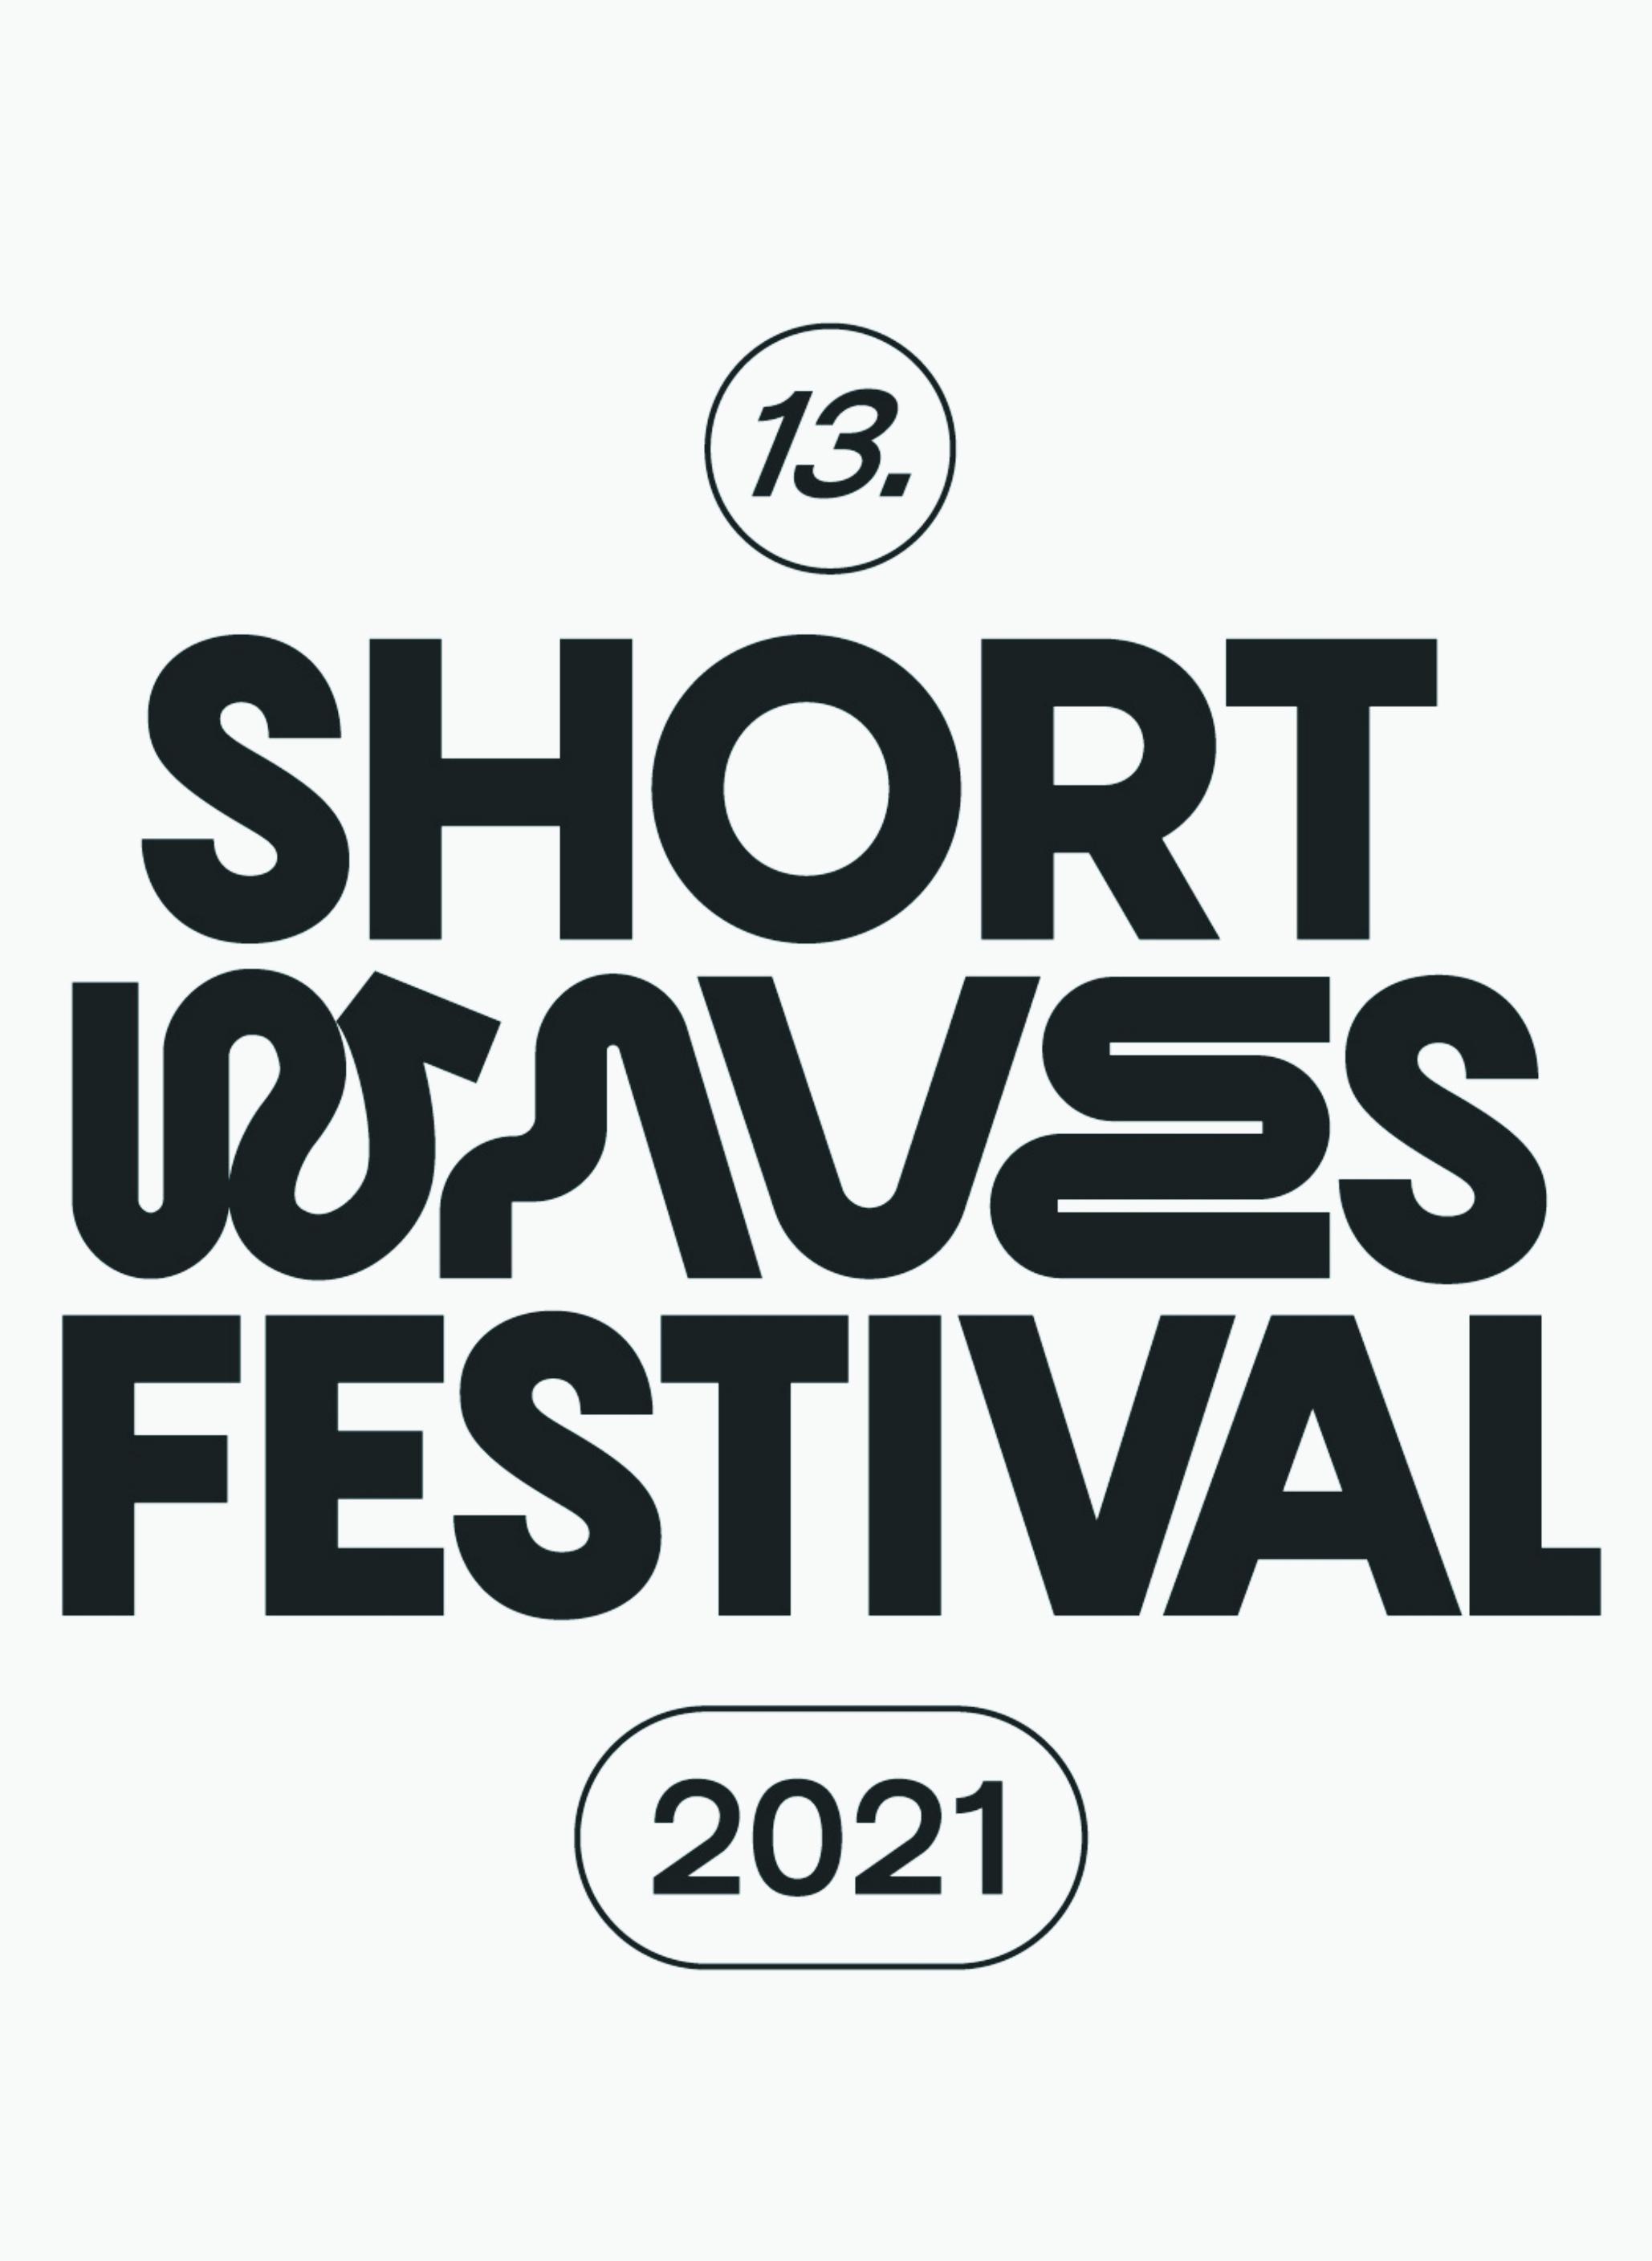 Short Waves Festival 2021 - Fokus Austria: Diagonale I